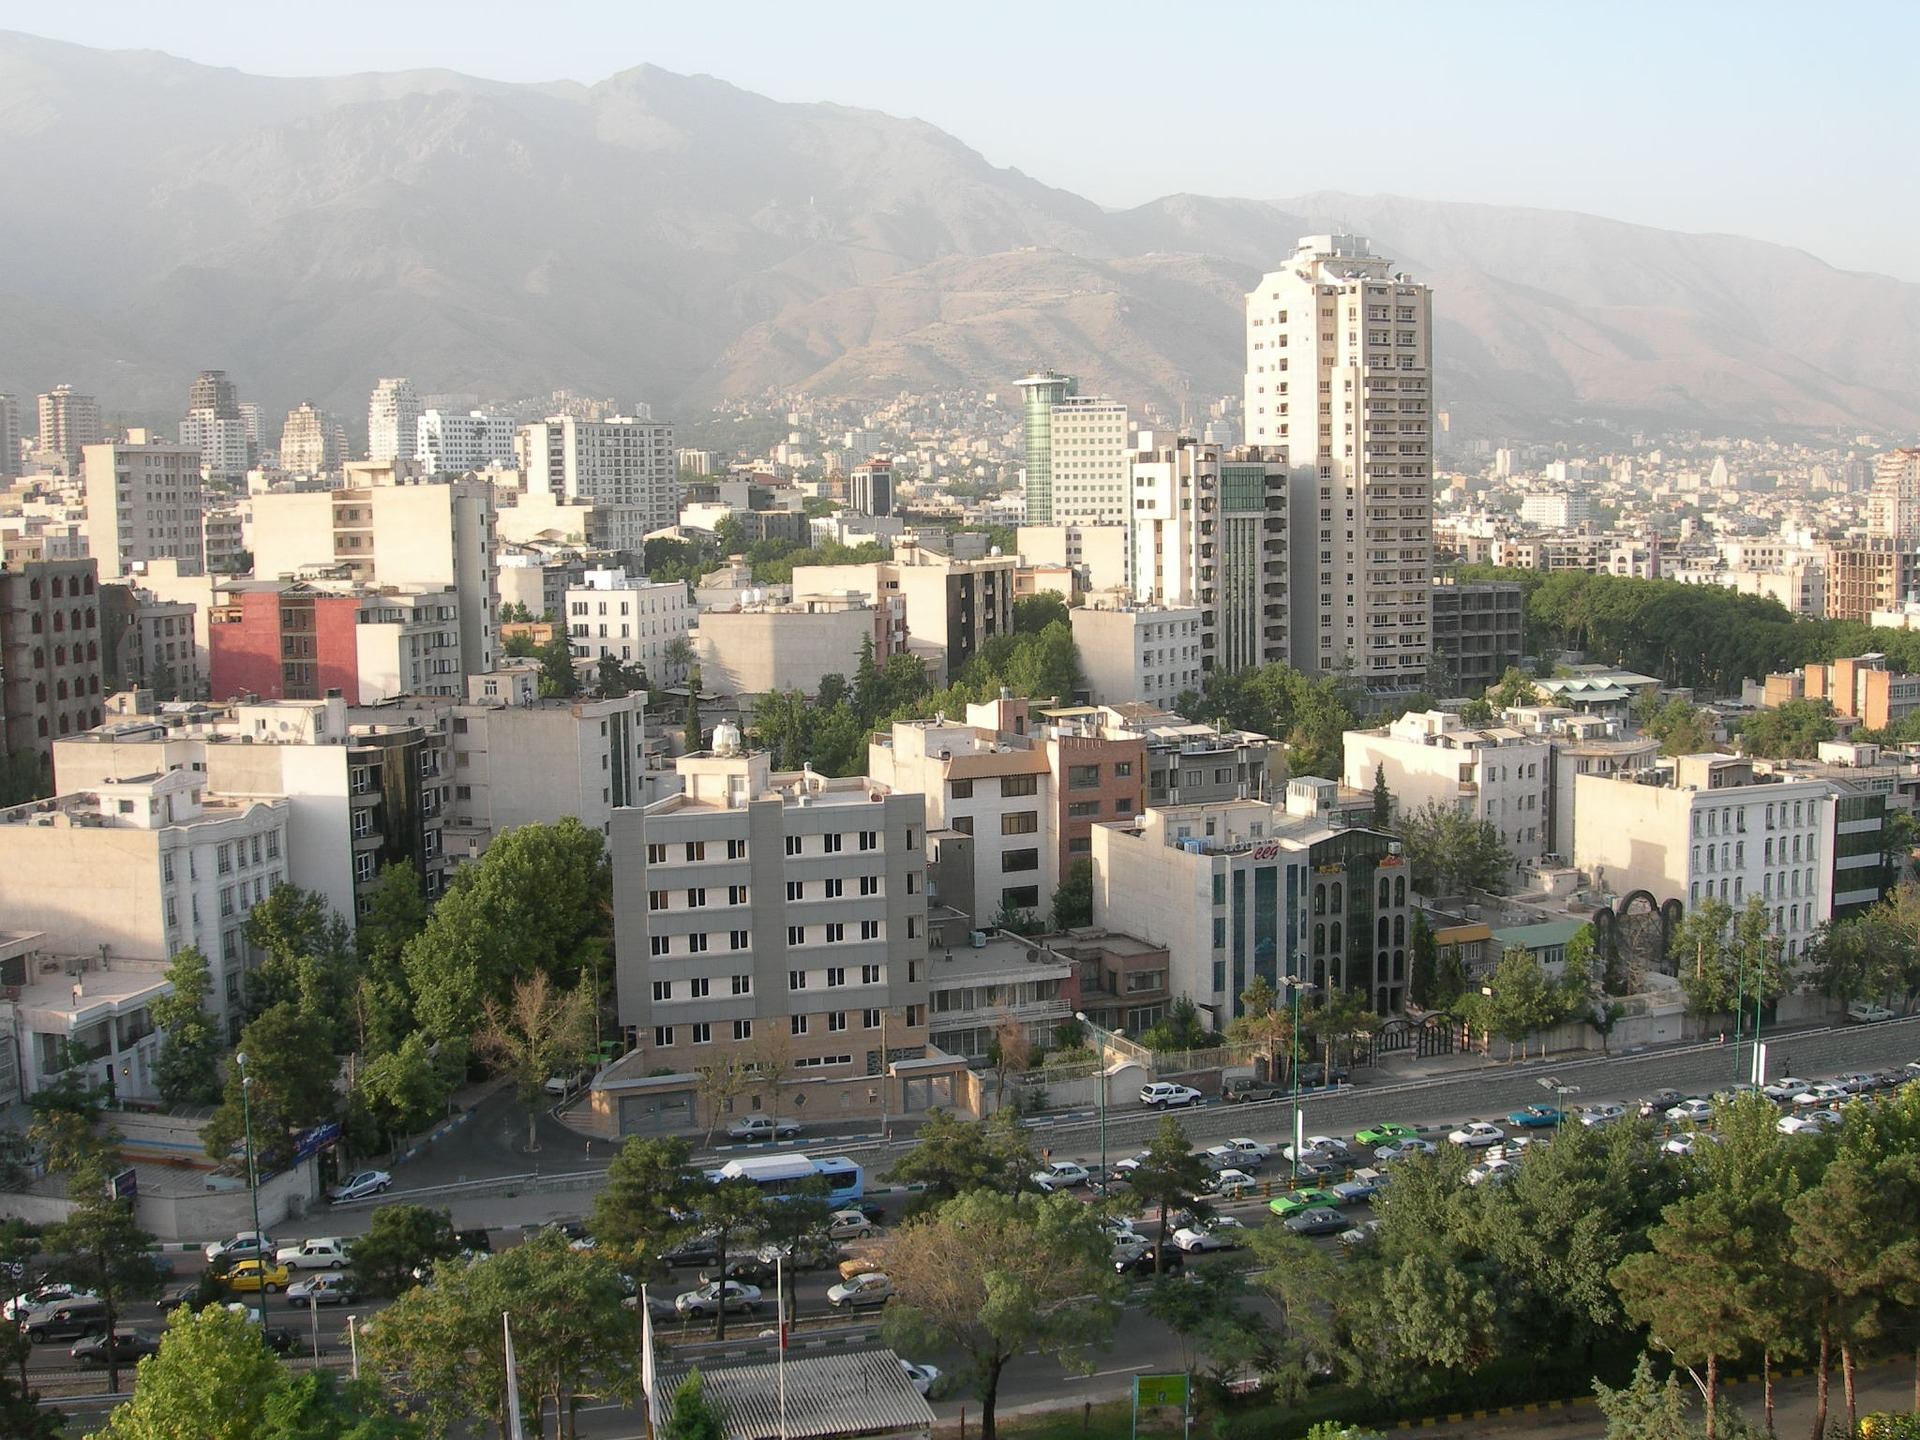 Veduta di Teheran, capitale dell'Iran